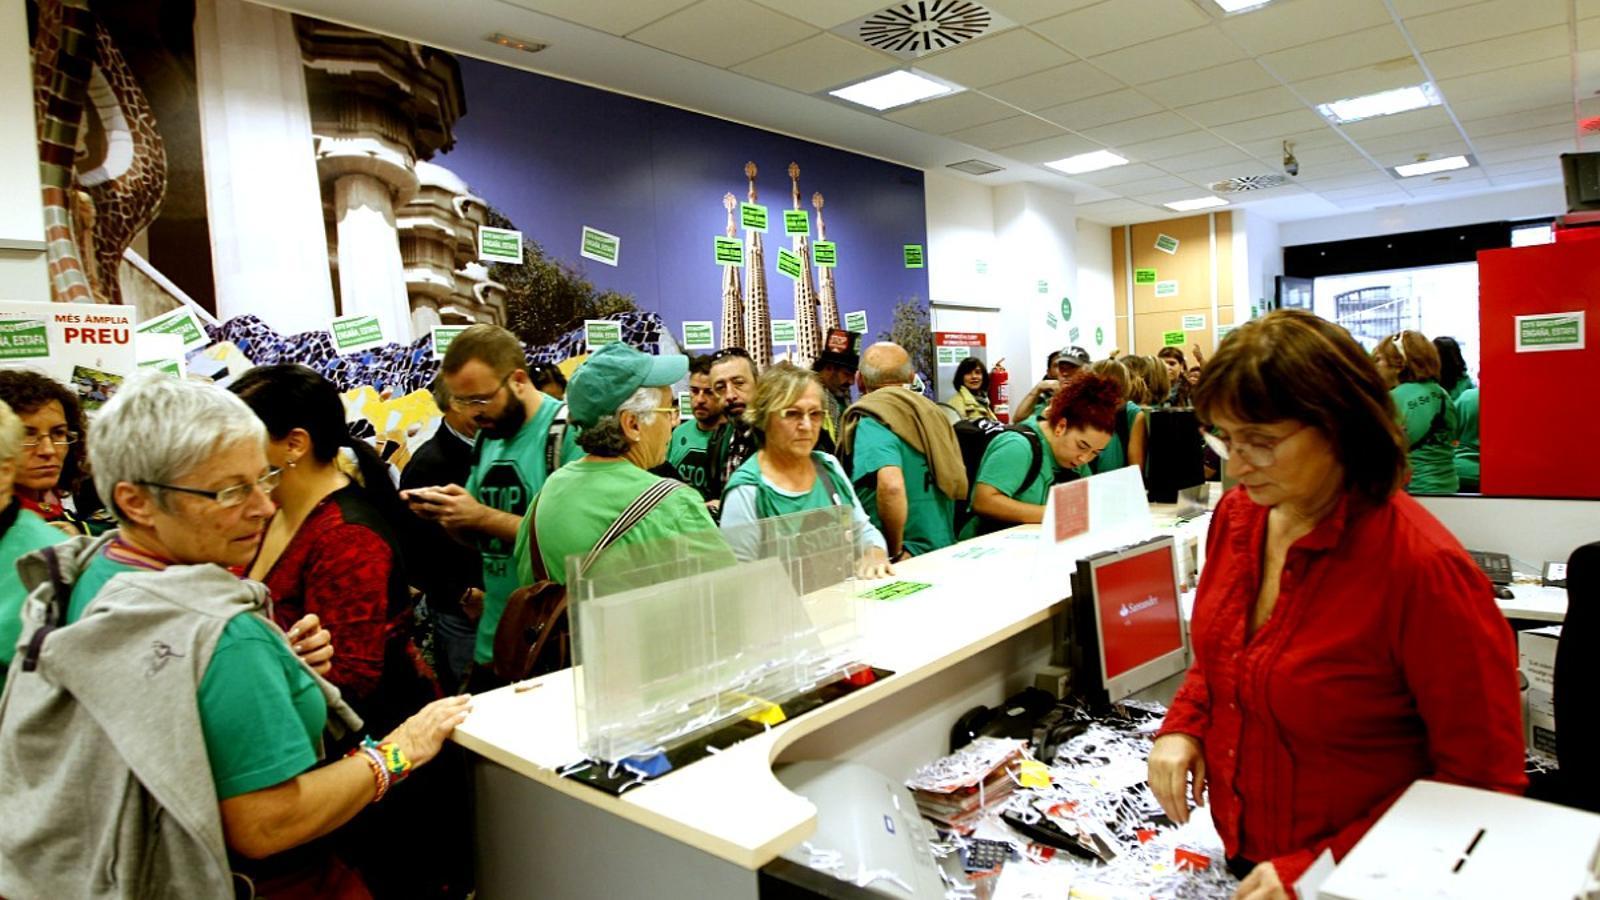 La pah ocupa una sucursal del banco santander a barcelona for Banco santander sucursales barcelona